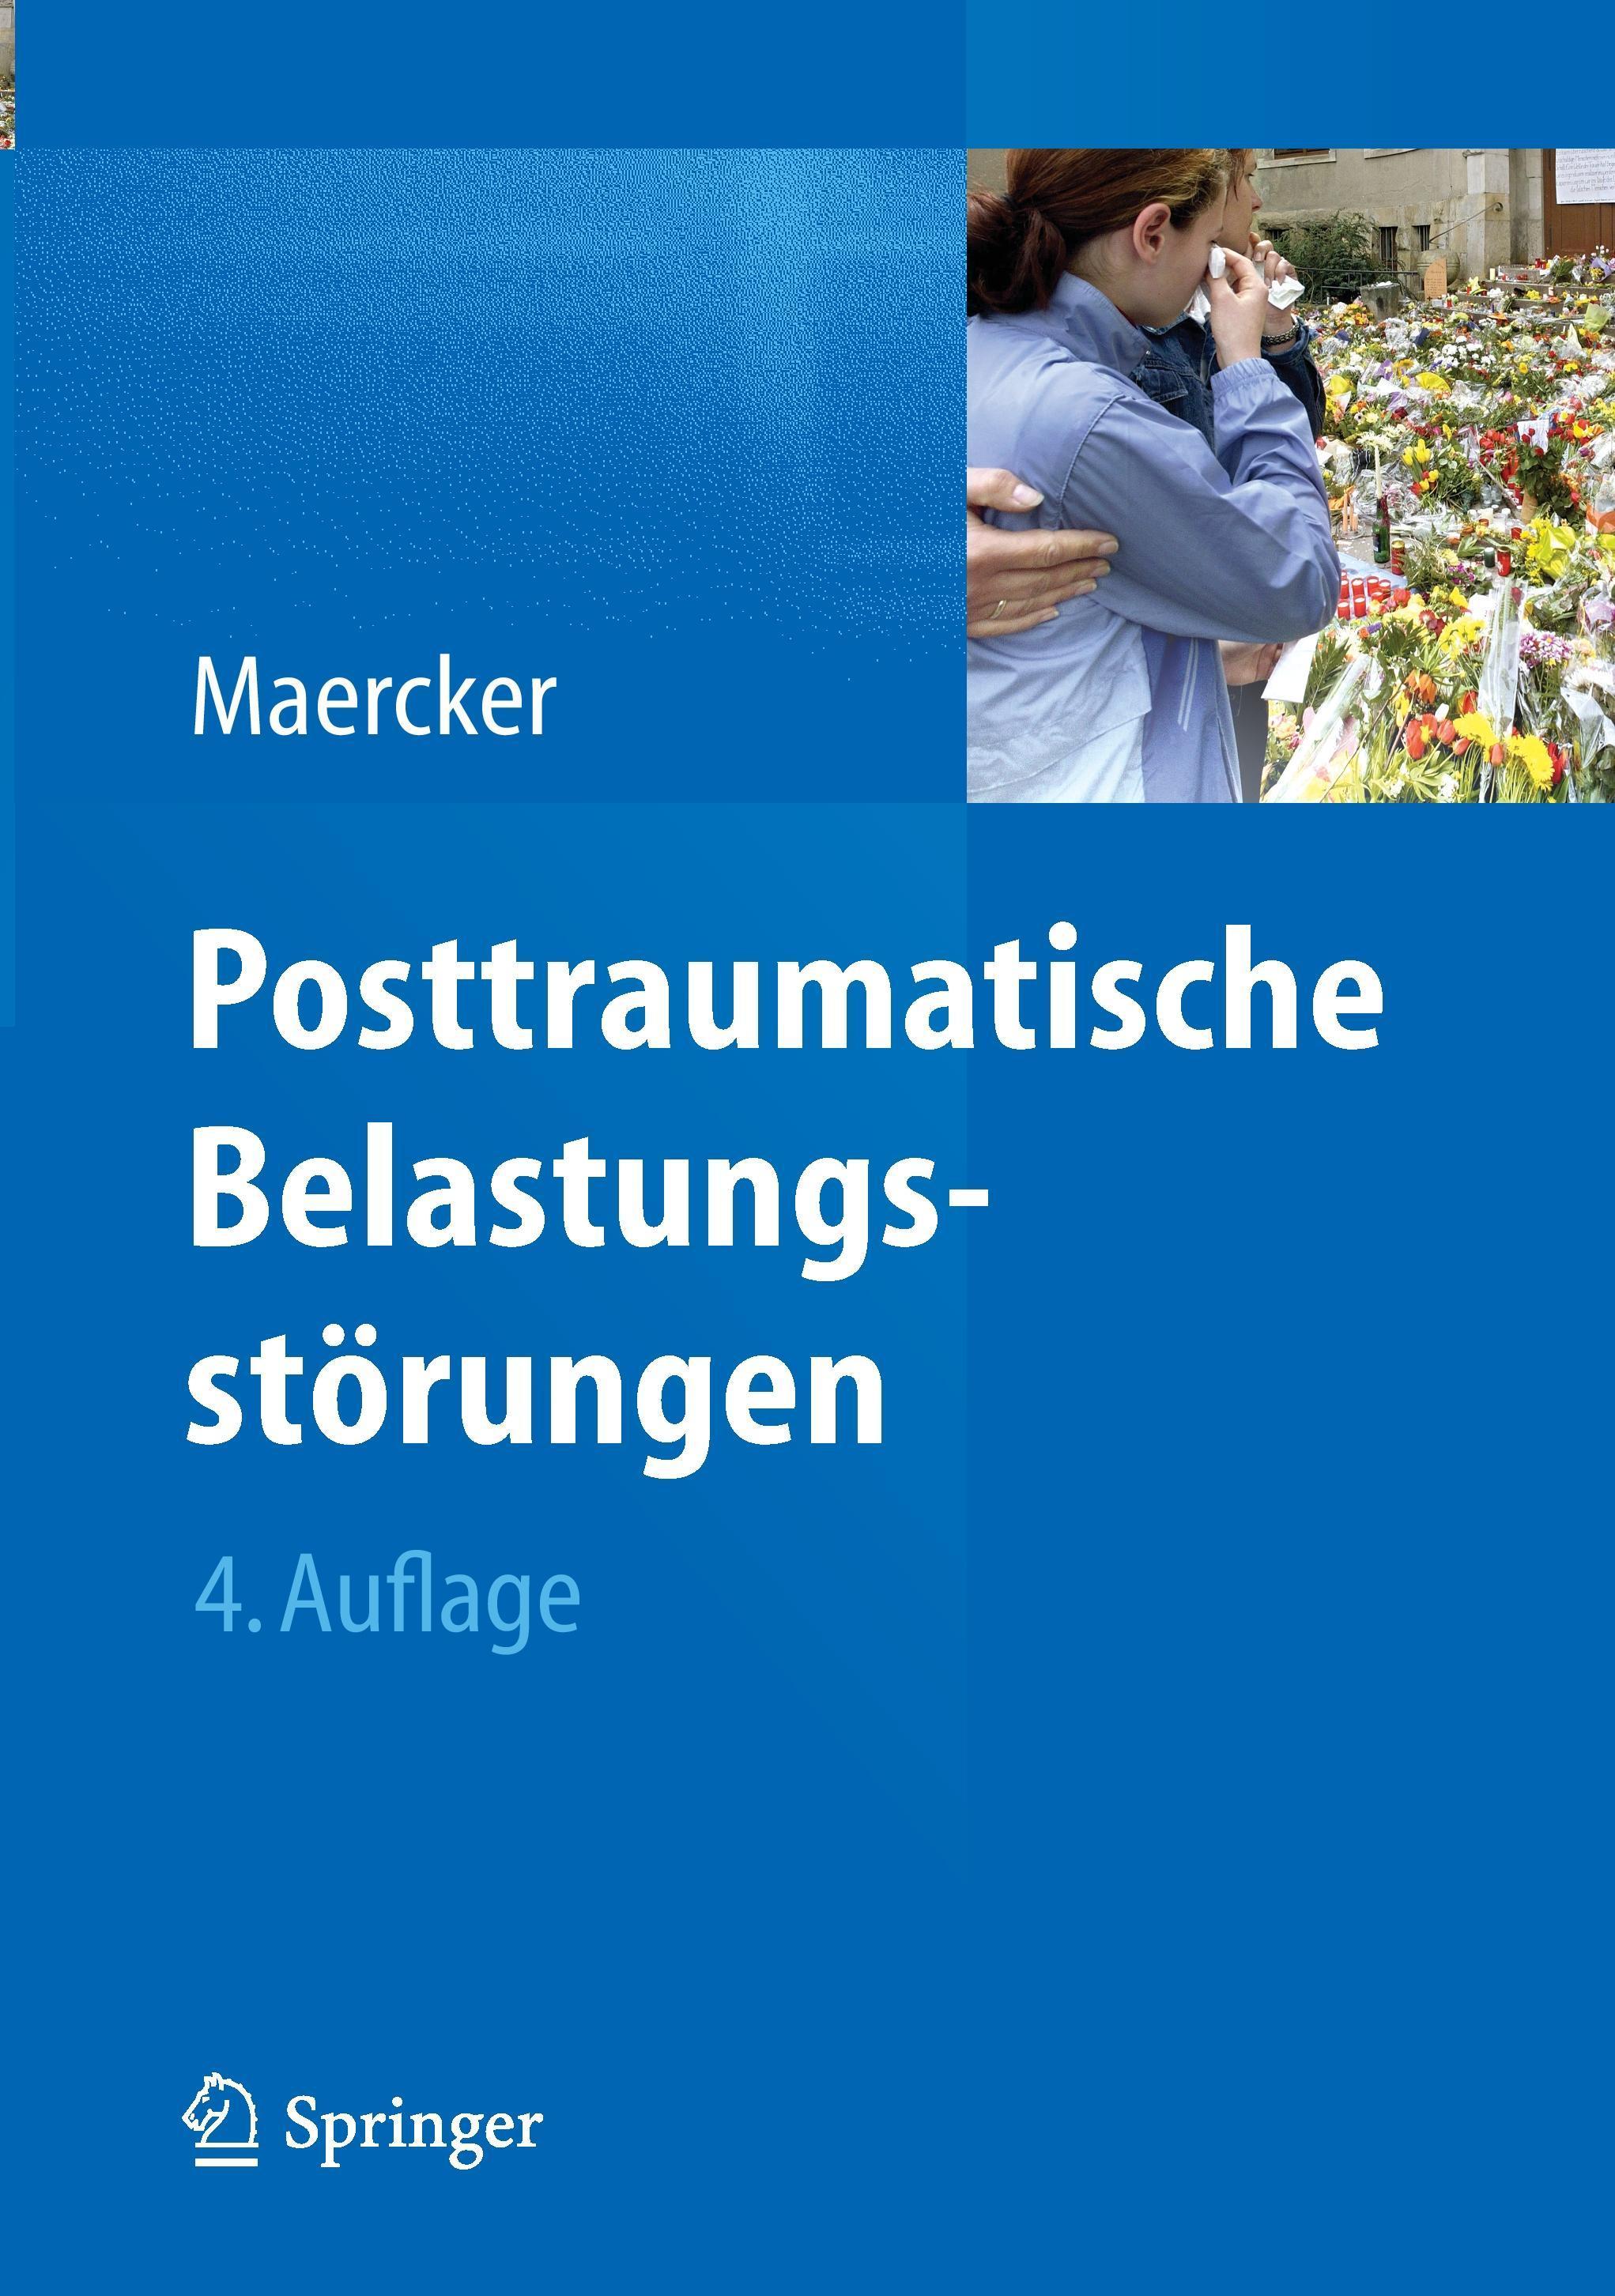 Posttraumatische-Belastungsstoerungen-Andreas-Maercker-9783642350672